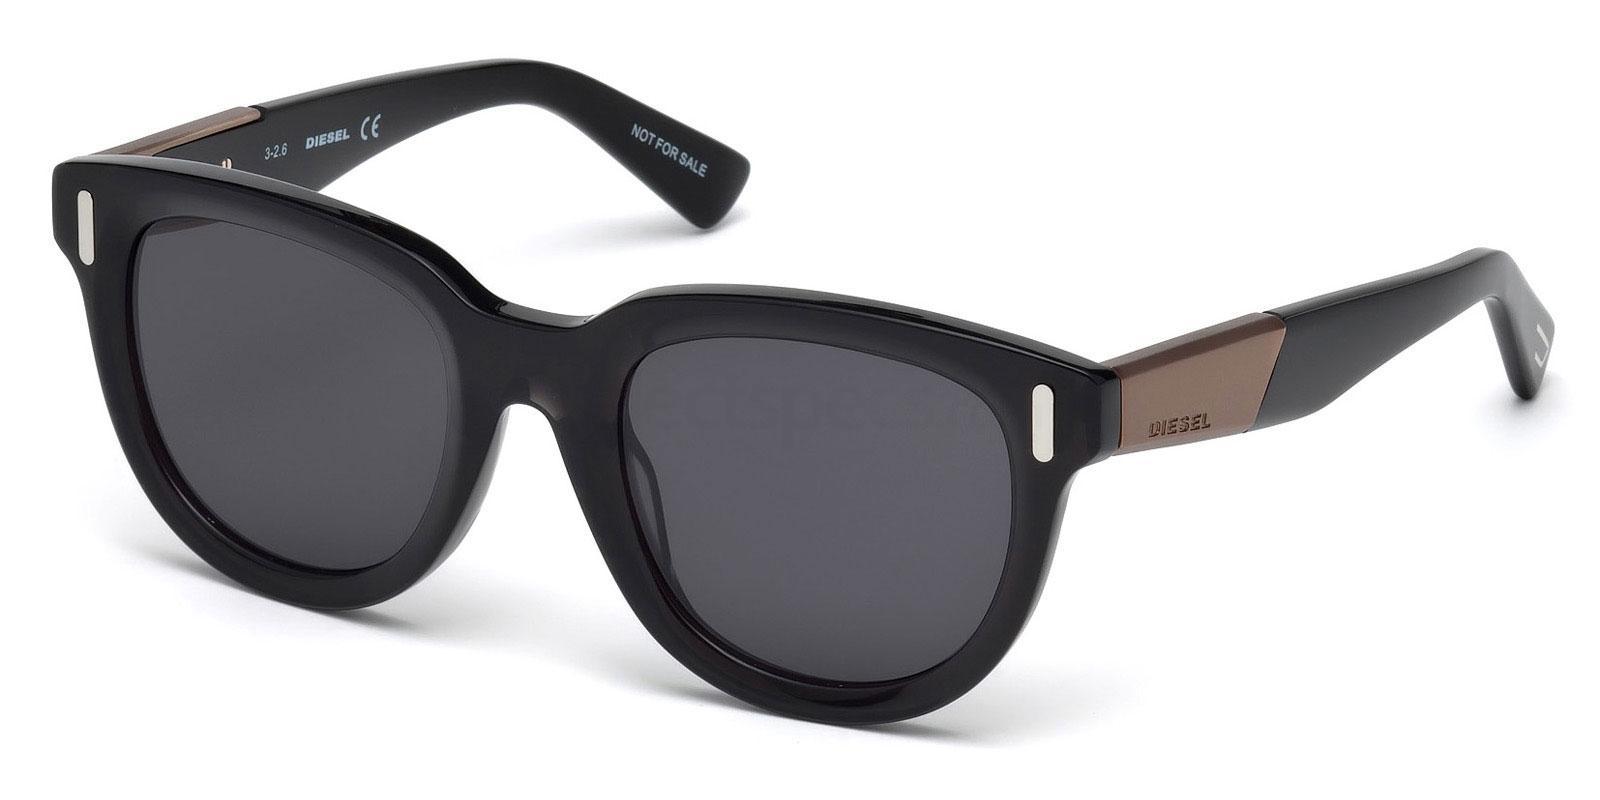 01A DL0228 Sunglasses, Diesel